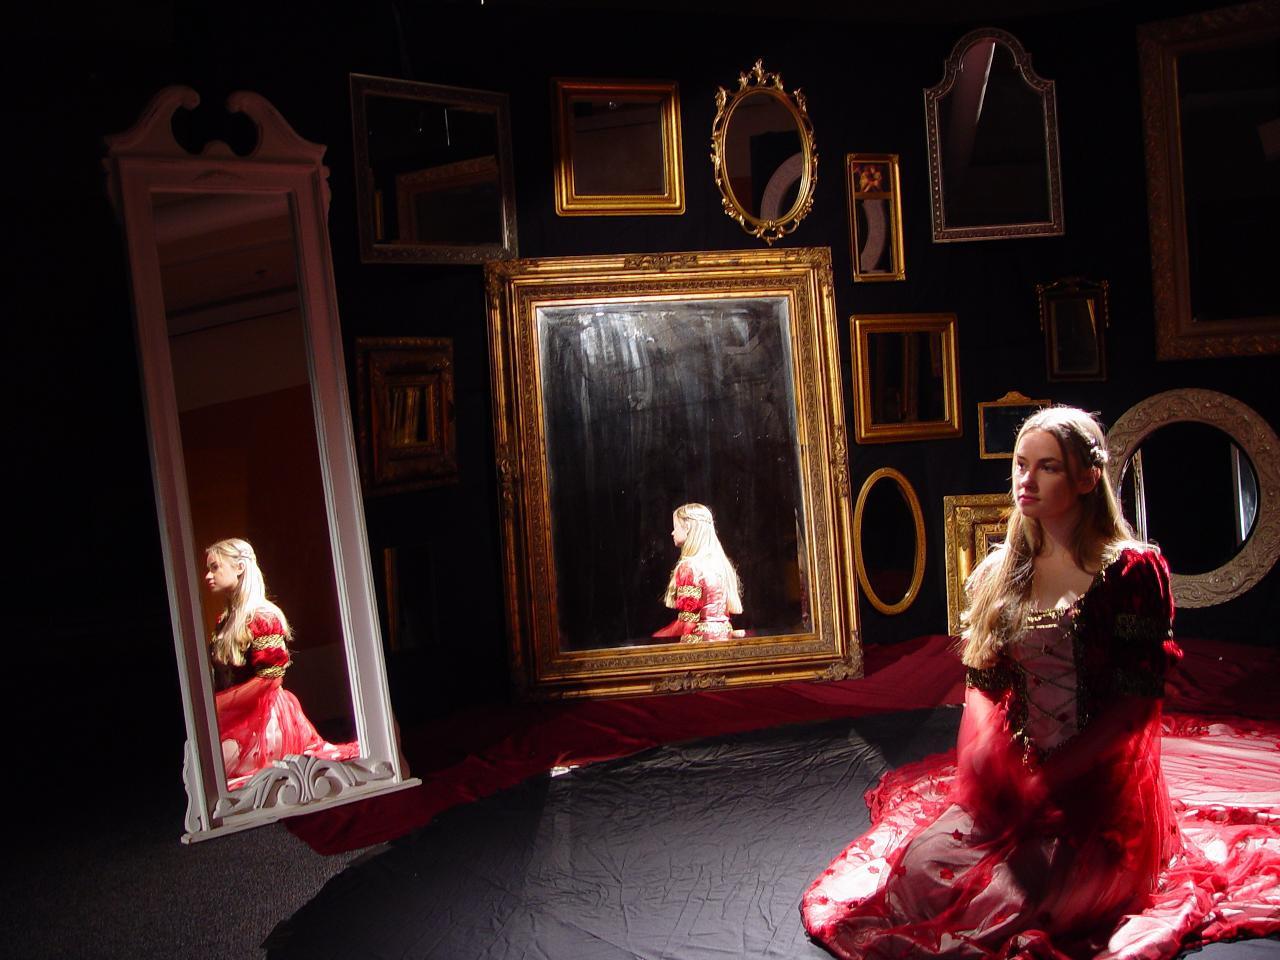 mirror room 4 by dislexik mirror room 4 by dislexik. mirror room 4 by dislexik on DeviantArt